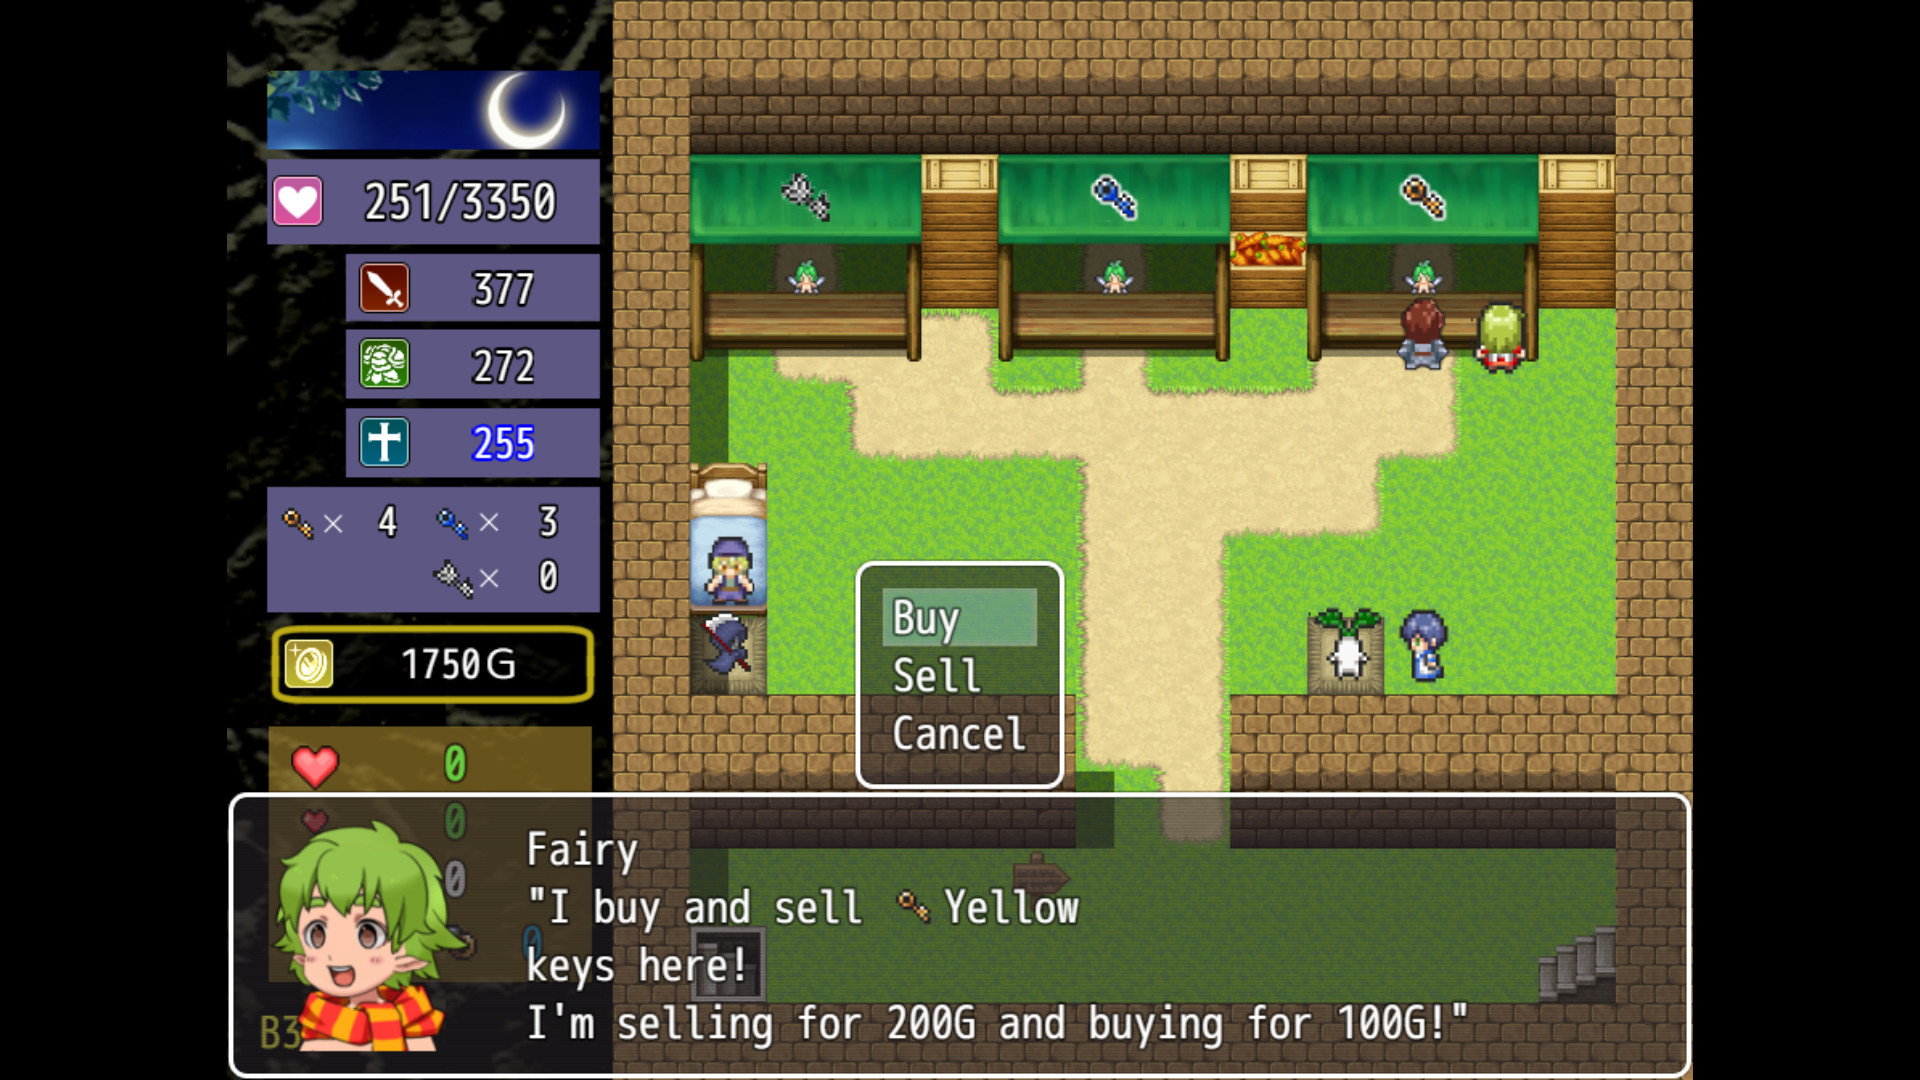 The Dungeon of Lulu Farea screenshot